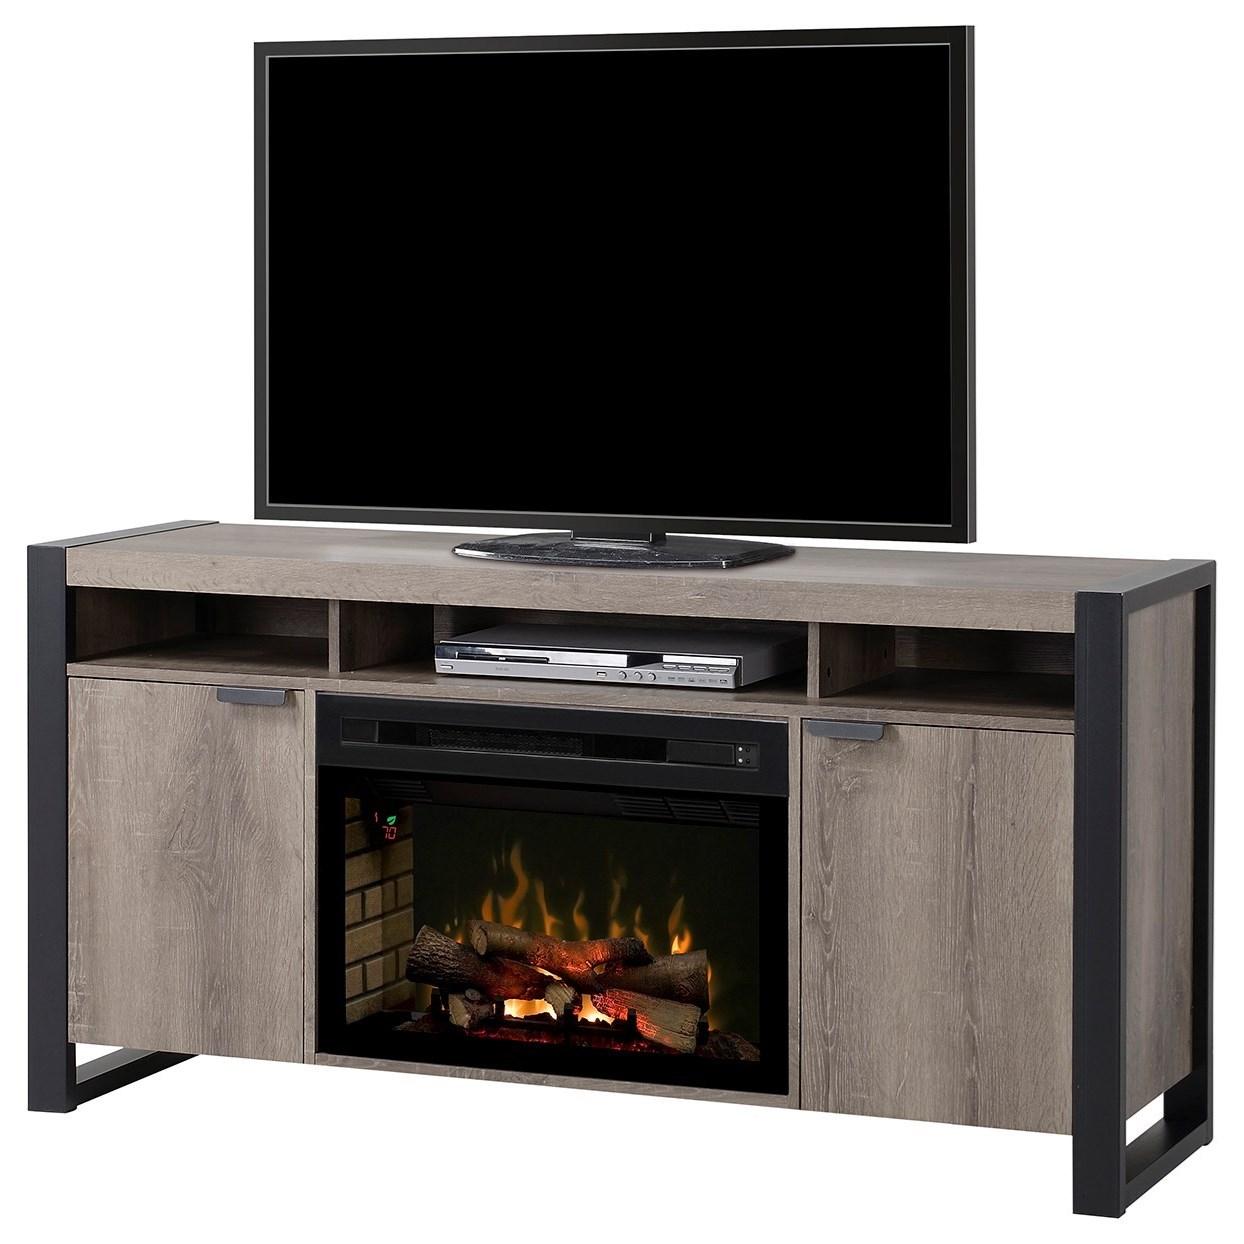 Dimplex Media Console Fireplaces GDS25LD 1571ST Pierre